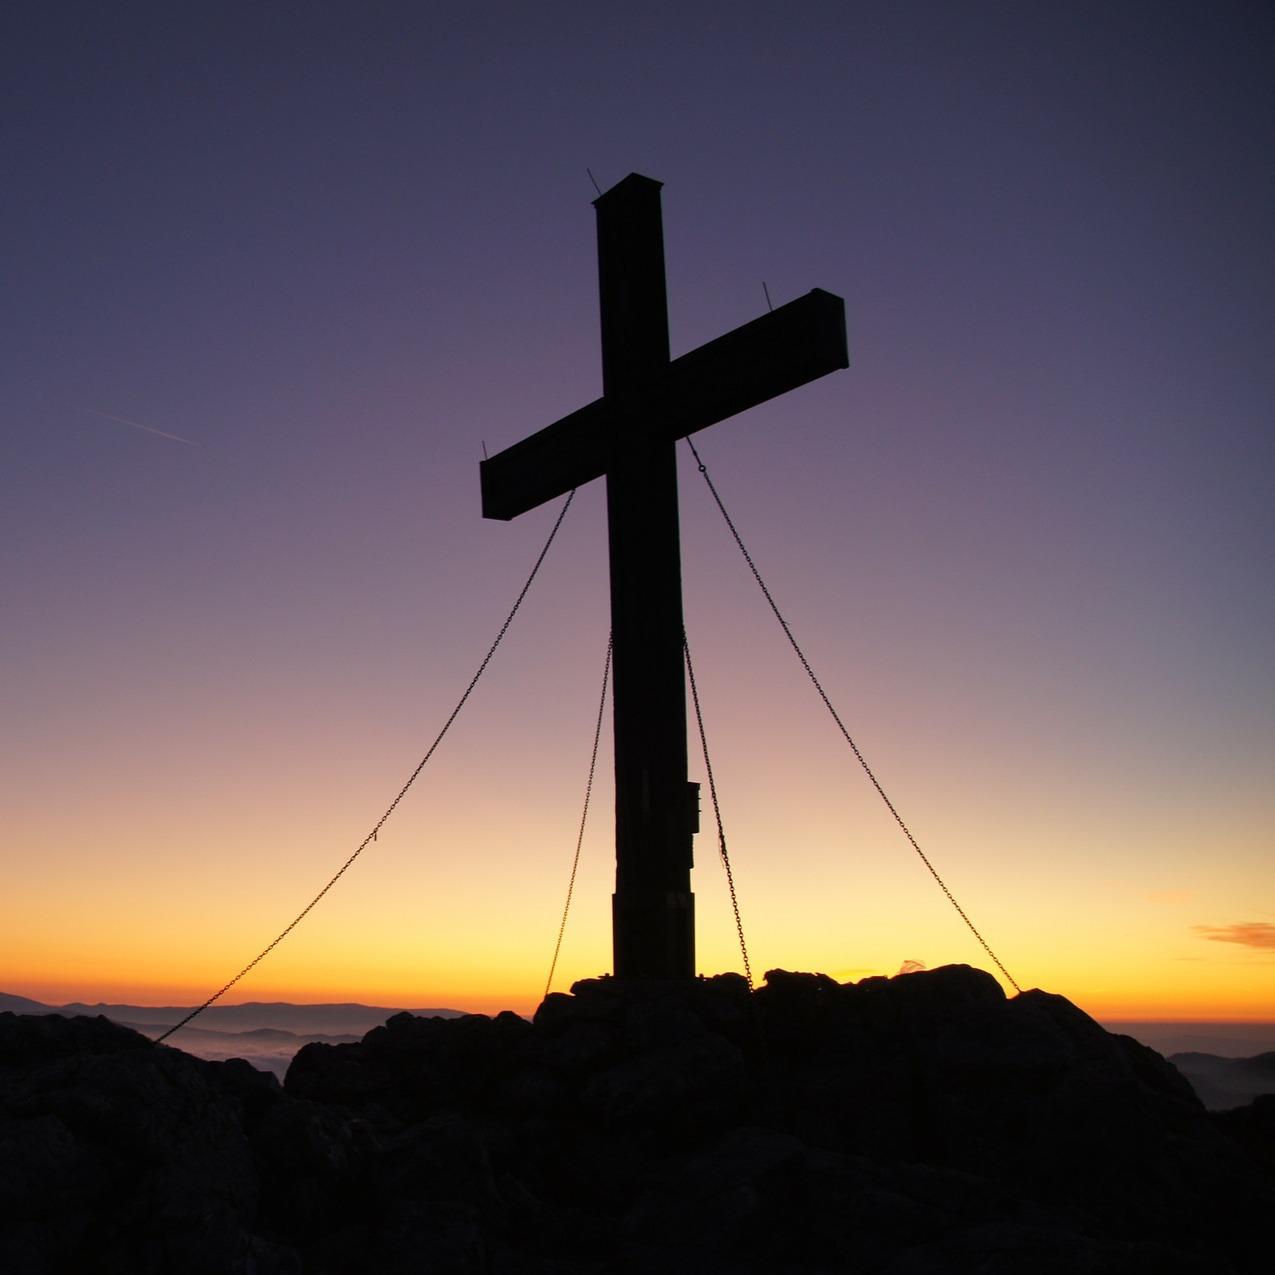 10/04/2020 – Good Friday Service – Luke 13: 22-30